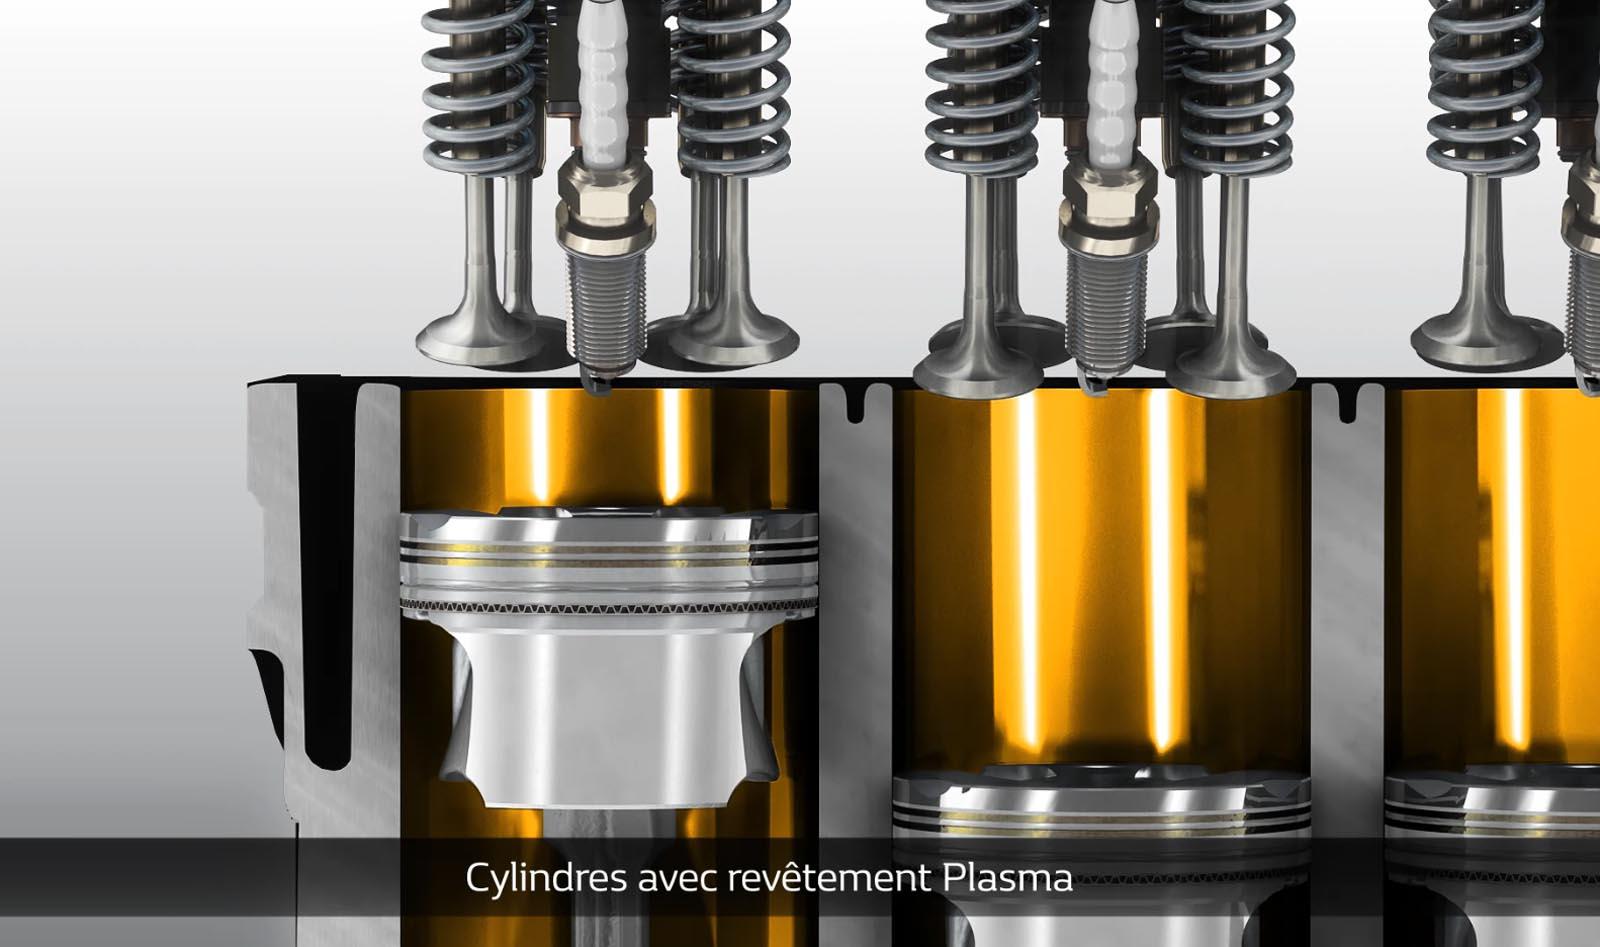 Photo of Ο νέος Energy βενζινοκινητήρας 1.3 TCe της Renault… στο μικροσκόπιο! [vid]